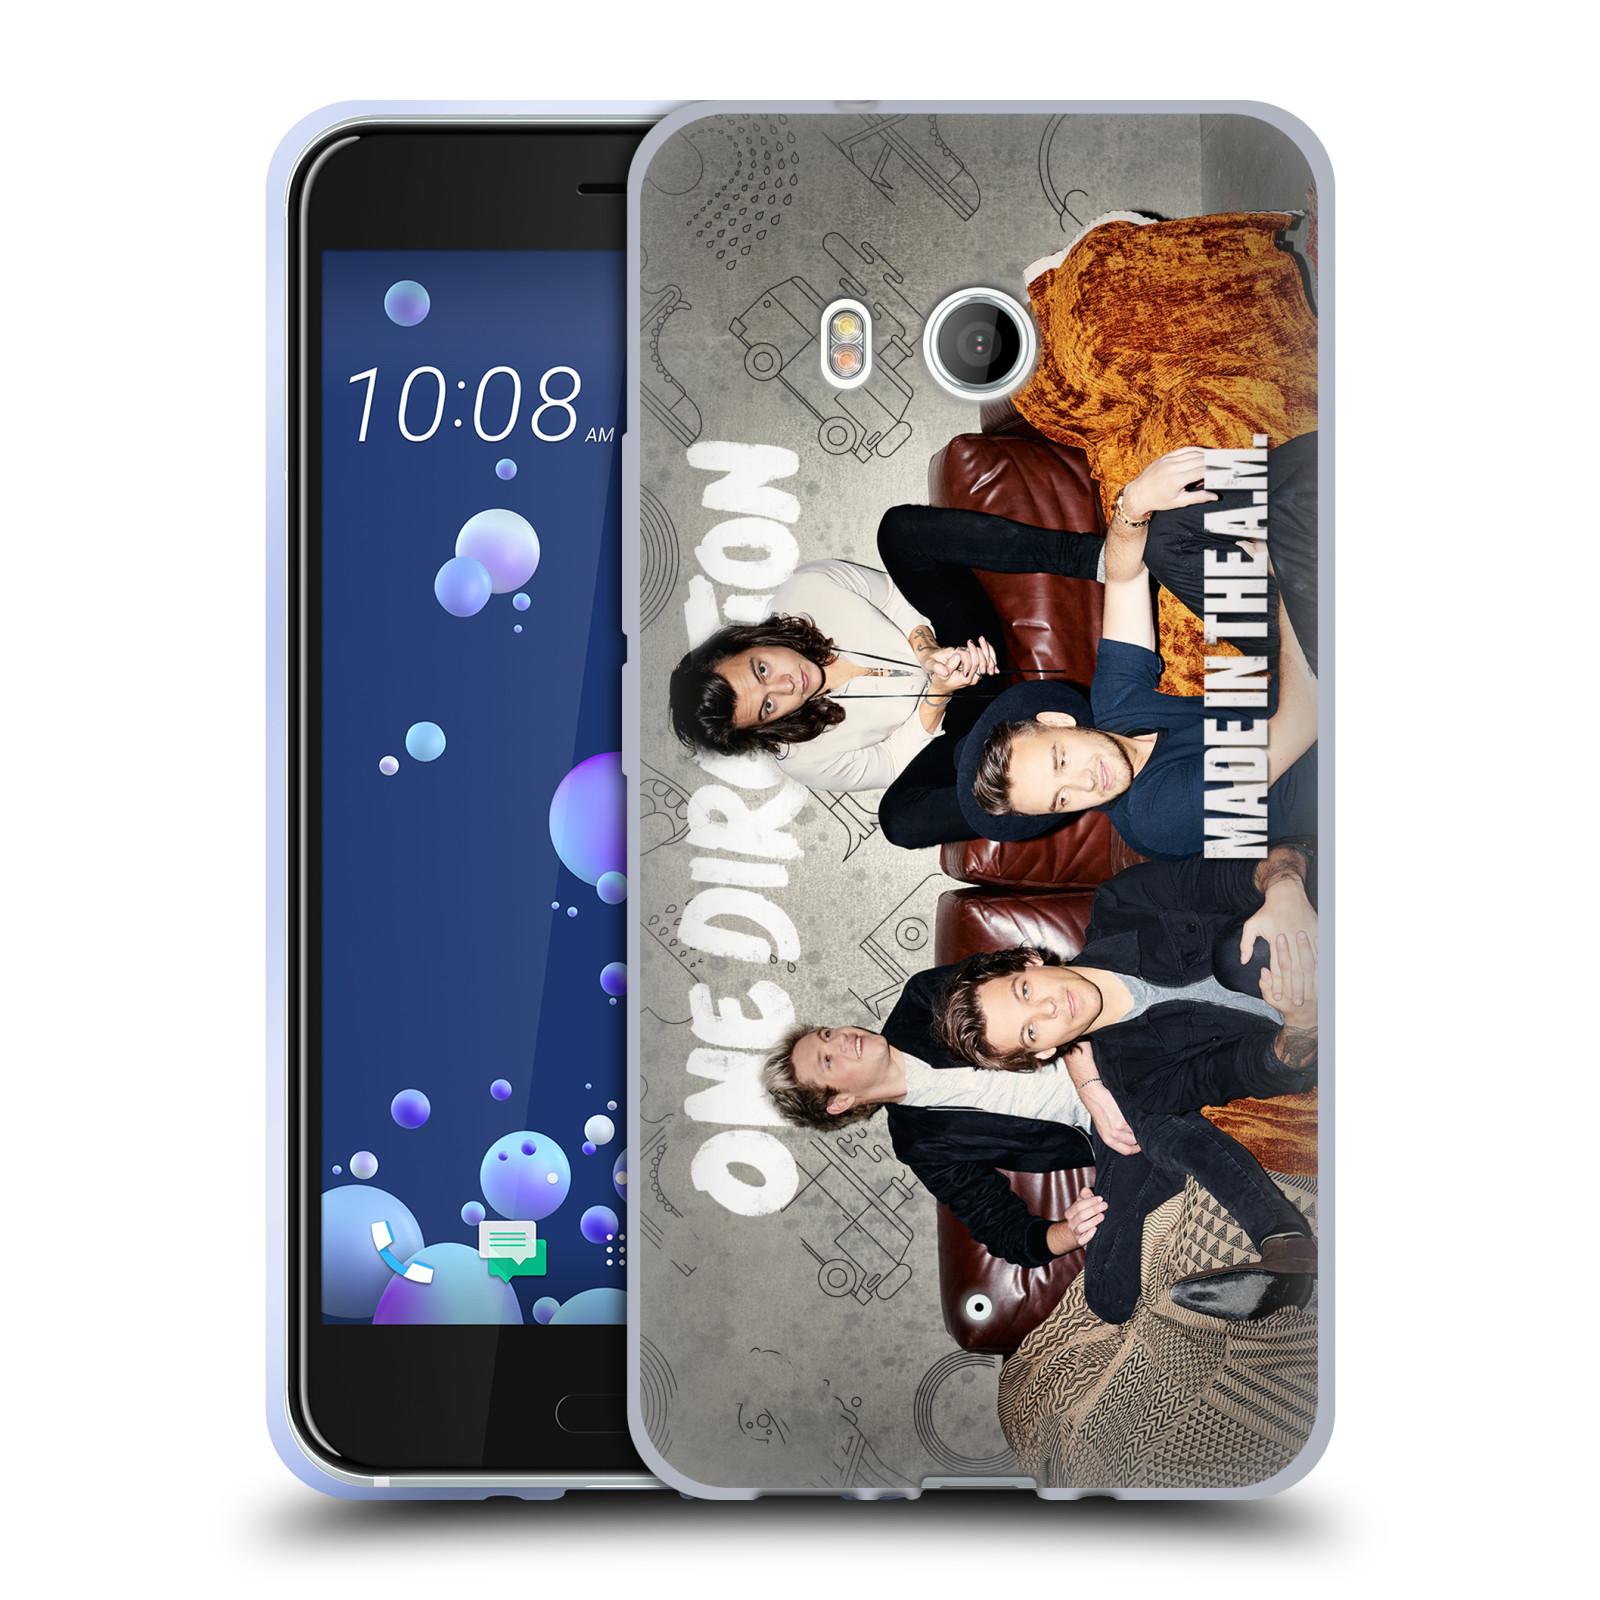 HEAD CASE silikonový obal na mobil HTC U11 / HTC U11 DUAL SIM chlapecká skupina One Direction gauč